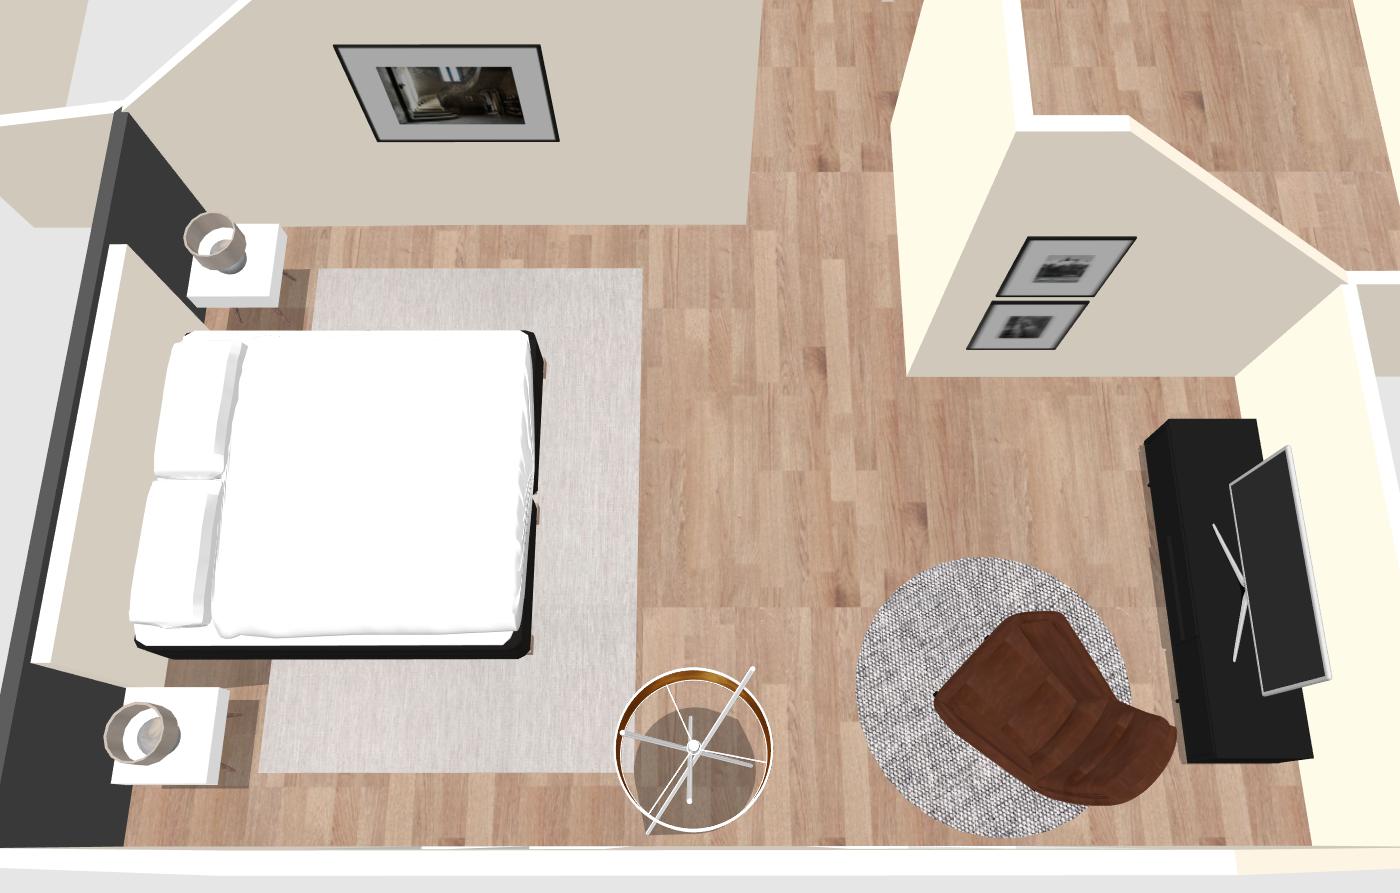 boxspringbett seite 4 bilder ideen couchstyle. Black Bedroom Furniture Sets. Home Design Ideas